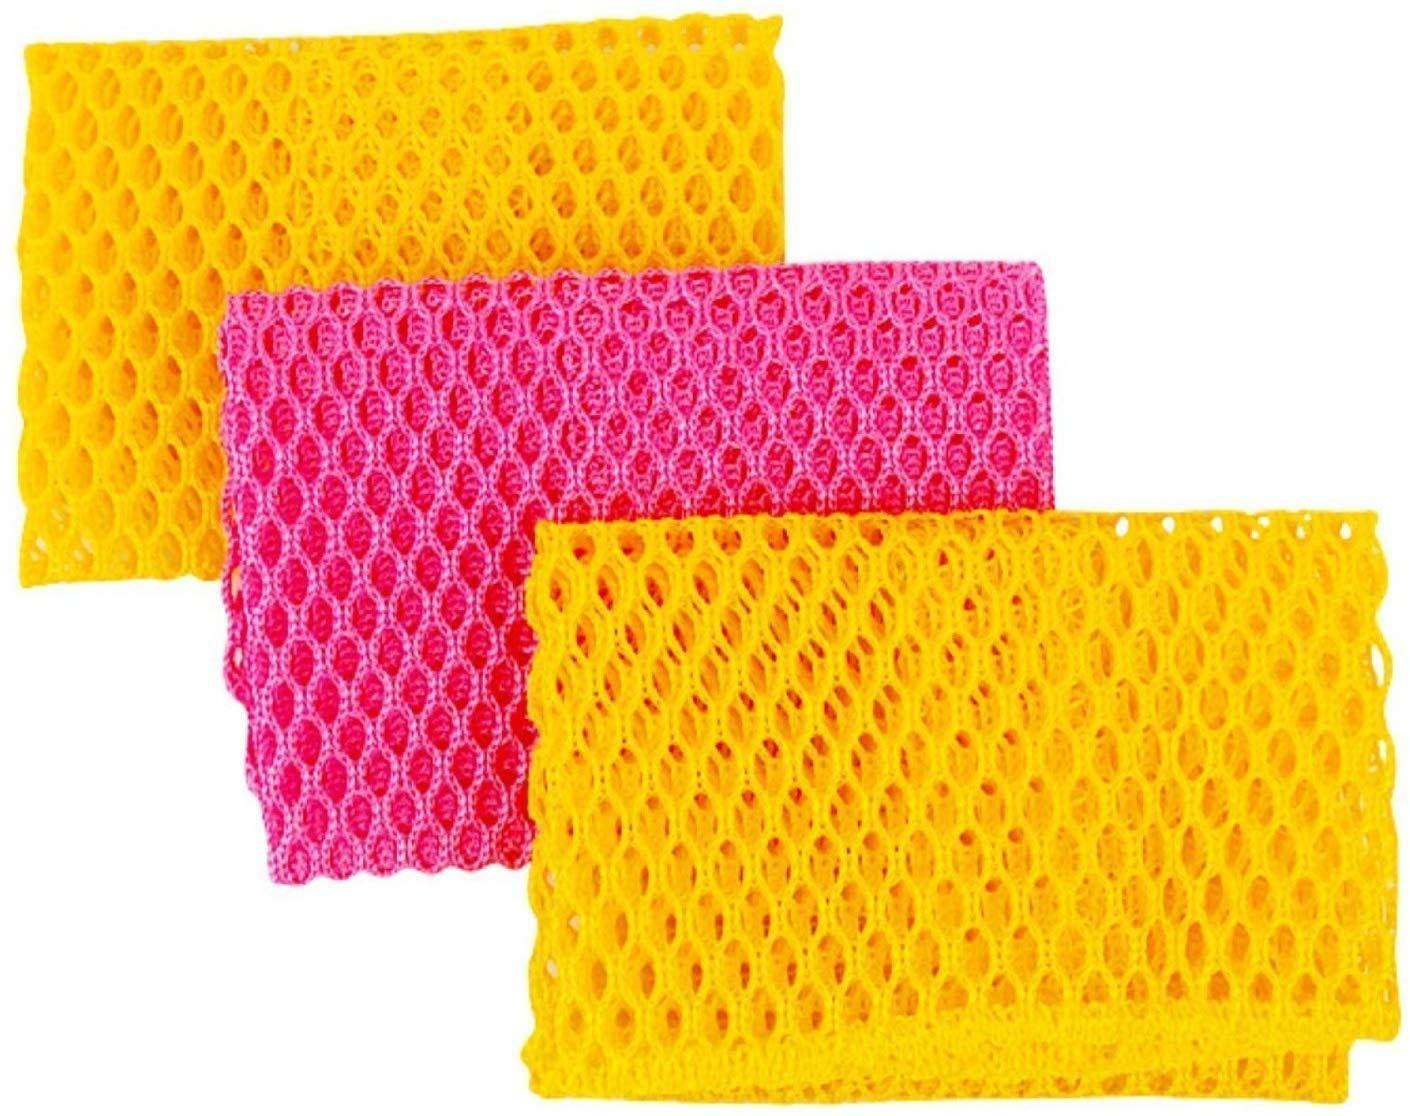 Innovation Dishwashing Net Cloths/ Scourer-100% Odor-free/quick Dry-no More Sponges